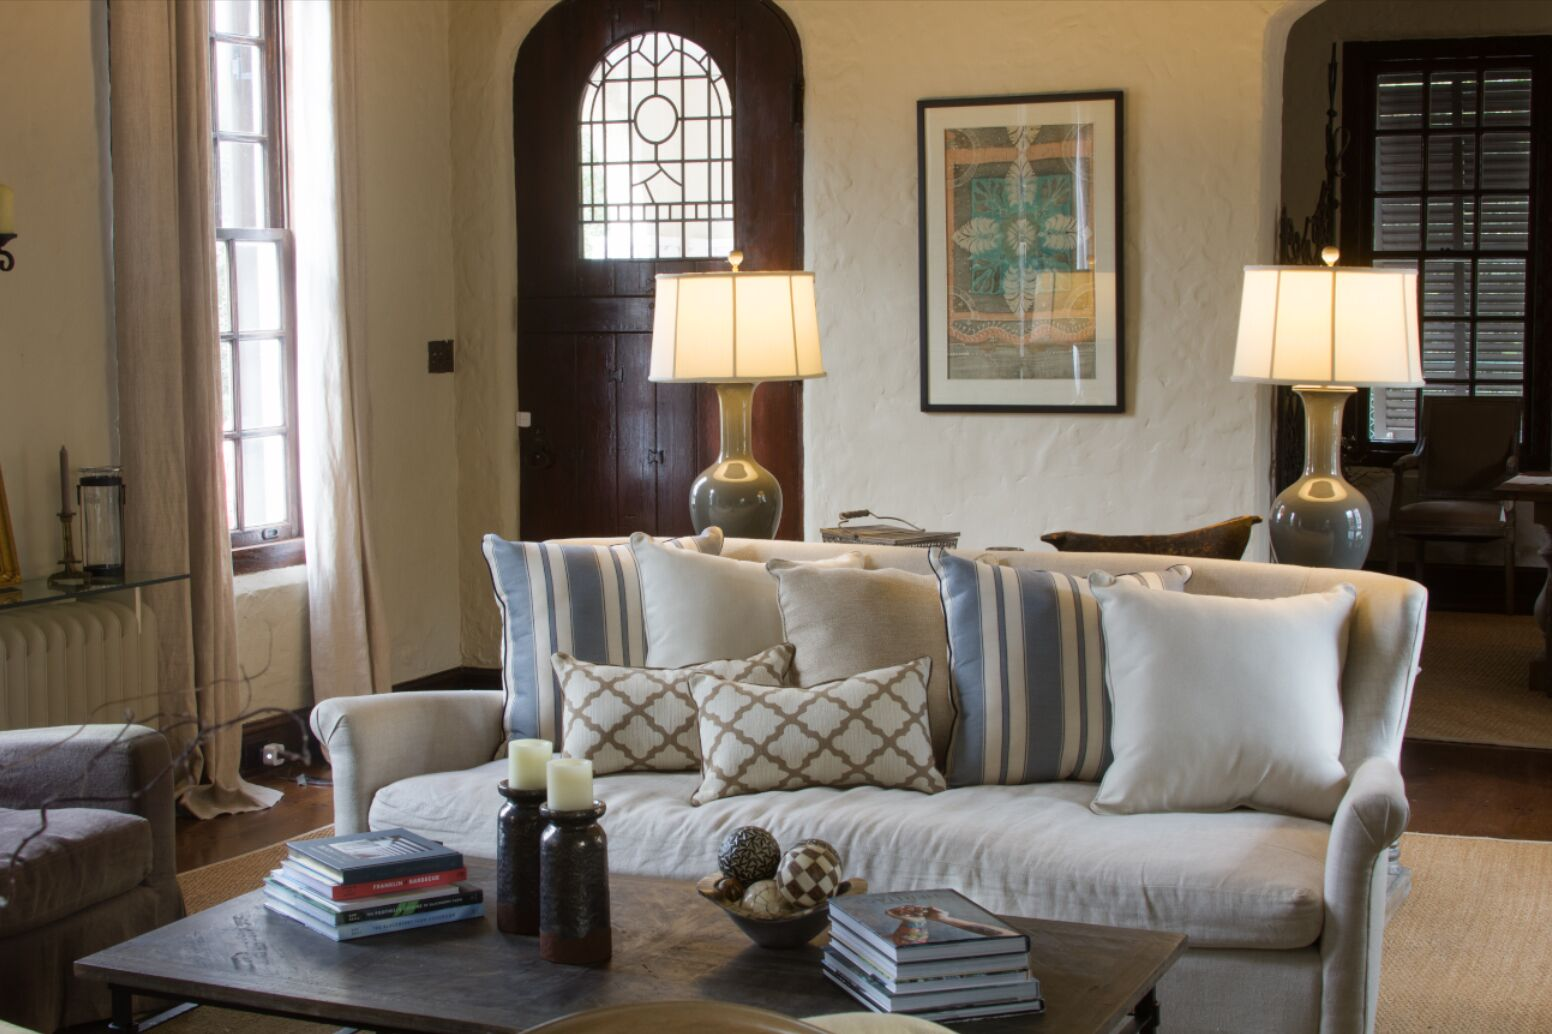 Blue Throw Pillows Decorative Pillows For A Bold Look